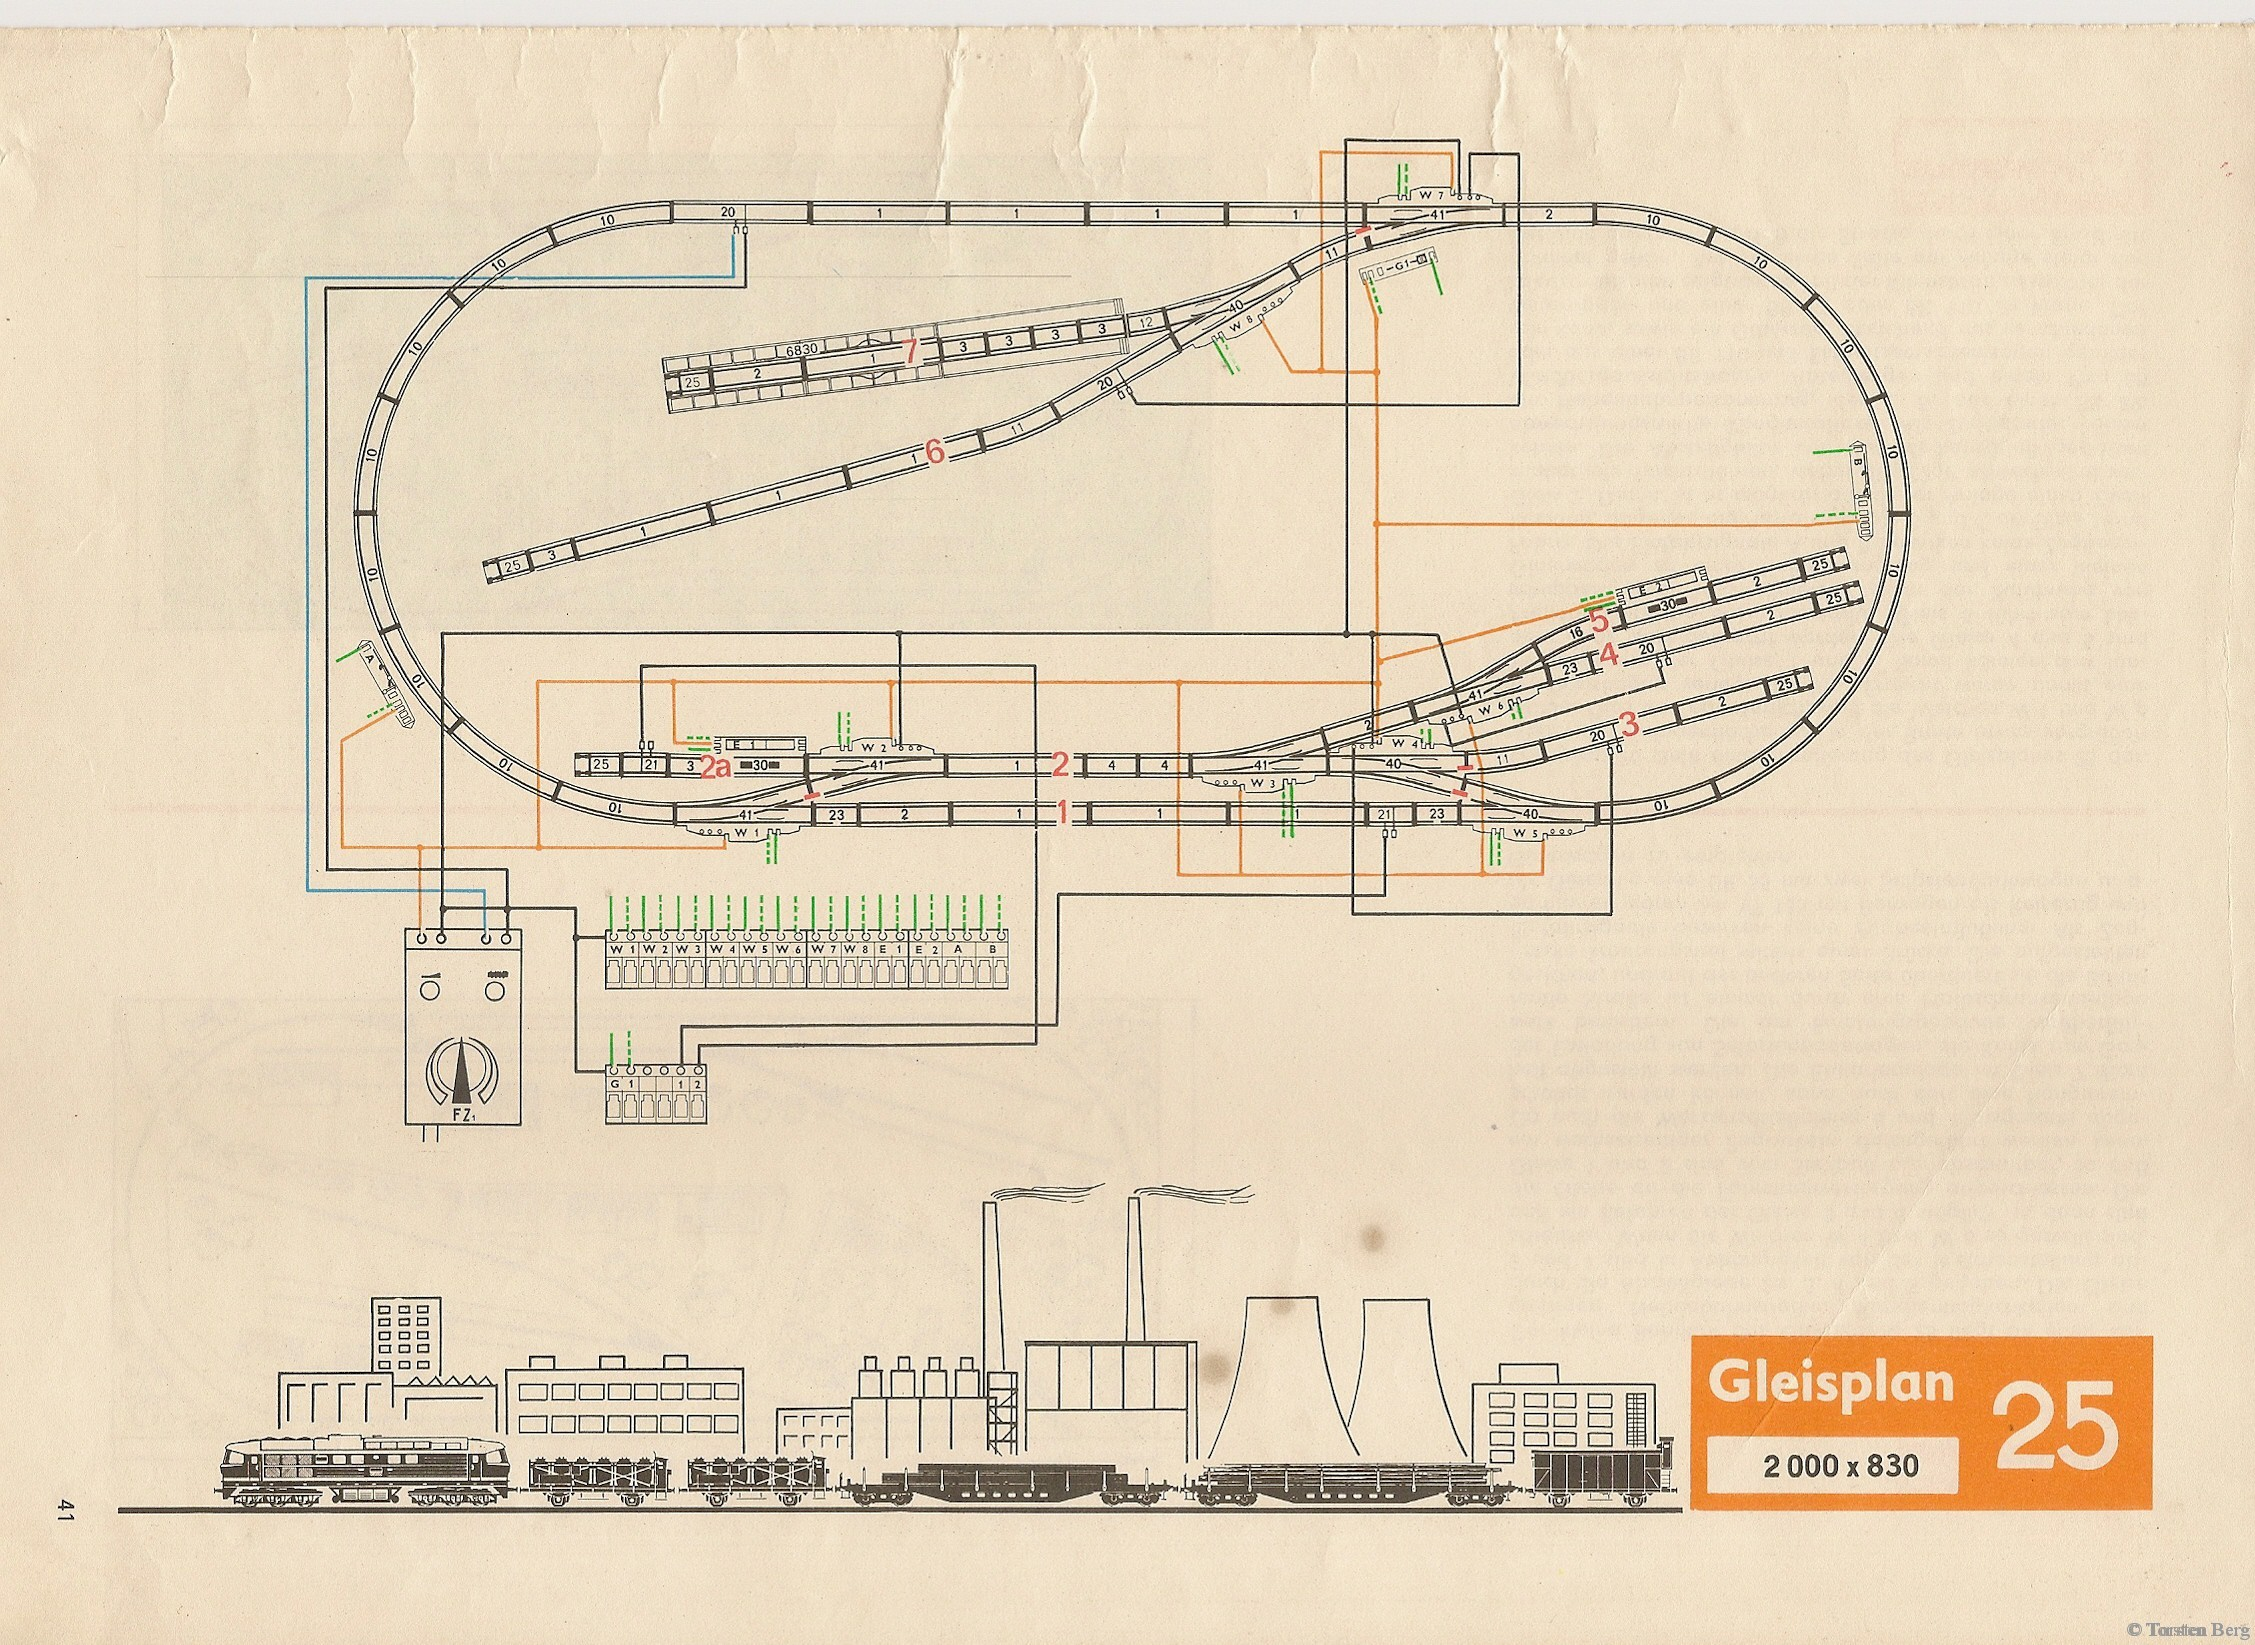 42 PIKO Standardgleis-Gleisplan 25